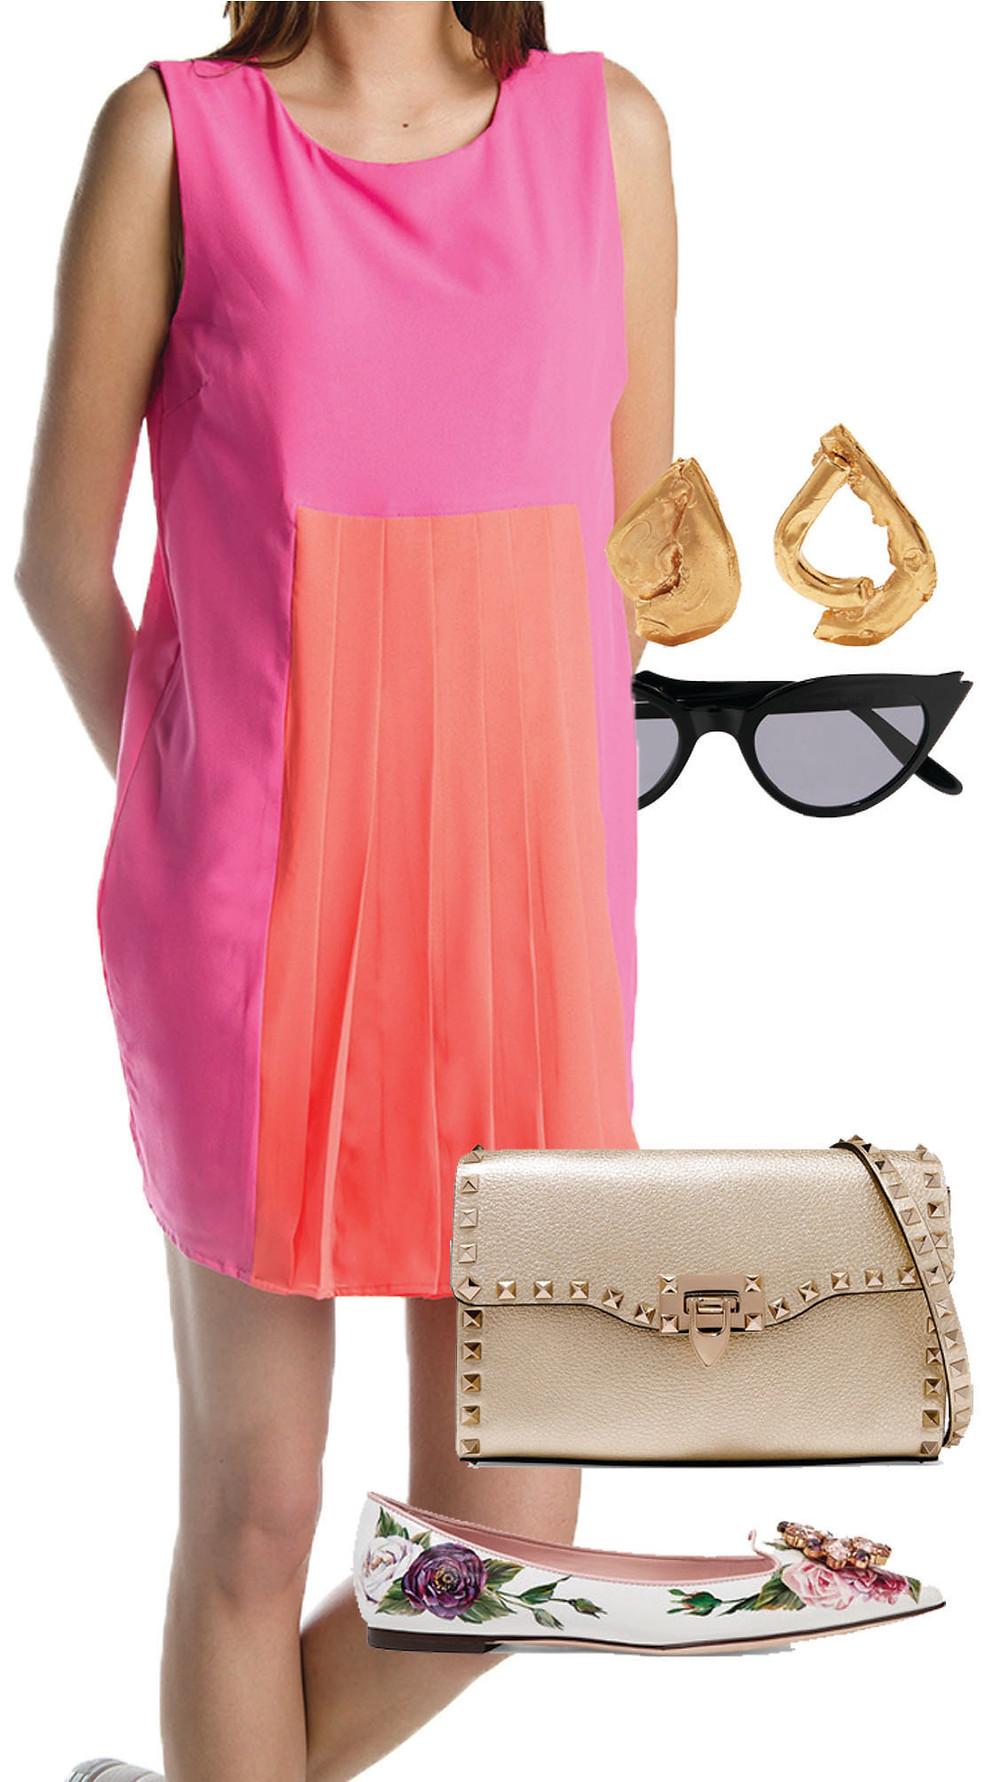 CARMENTA look fin de semana - vestido paletones